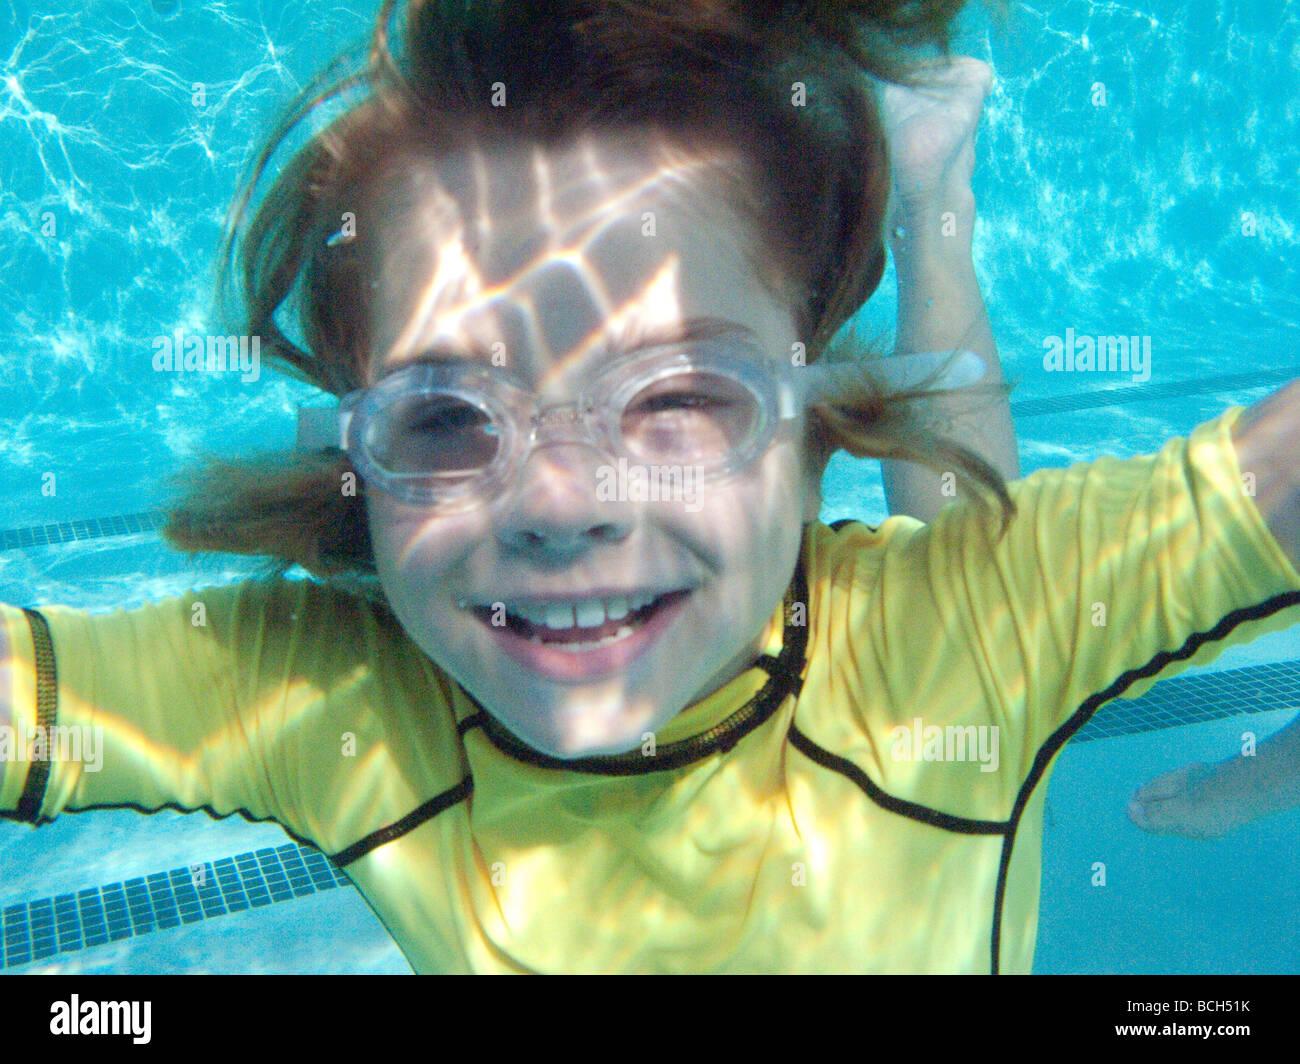 underwater pool swimming - Stock Image